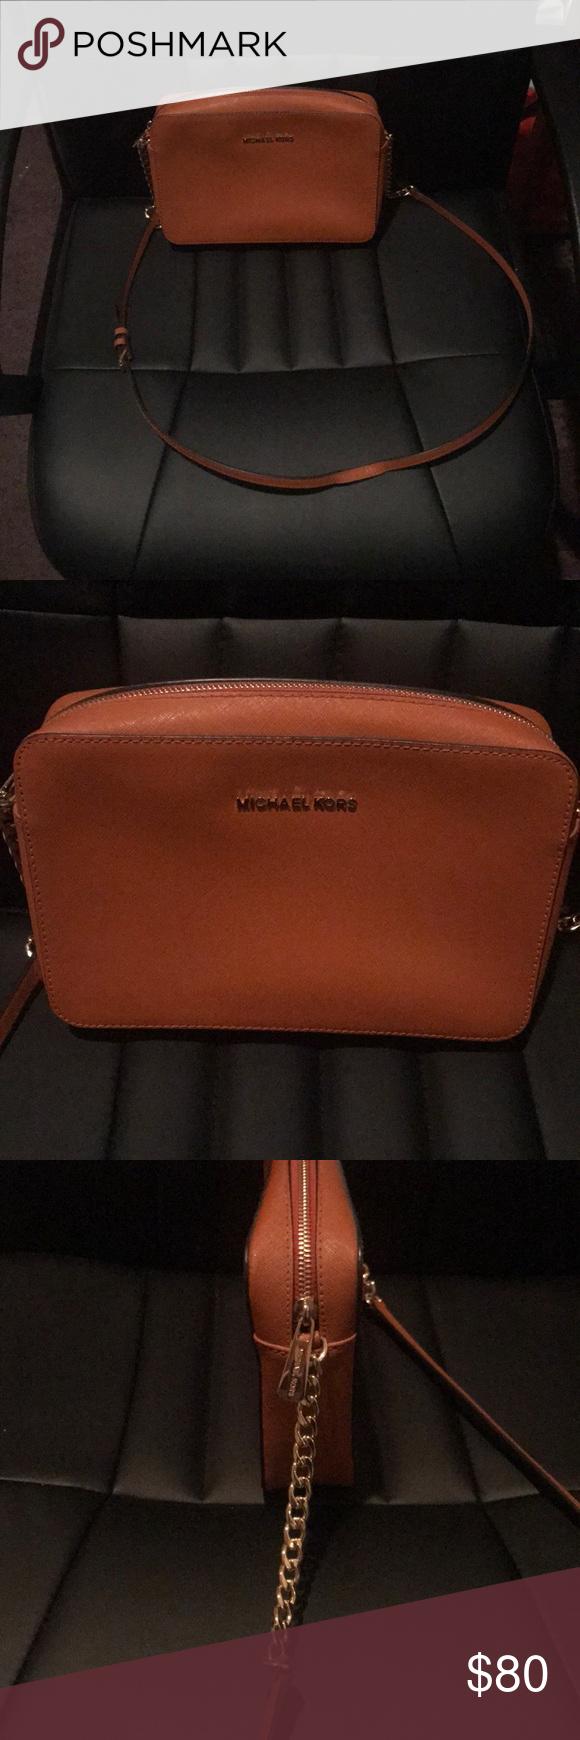 "4a9000fce867 Orange Michael Kors Purse Burnt orange crossbody bag with gold finishings.  Shoulder strap has 22"" drop. Great condition. Michael Kors Bags"